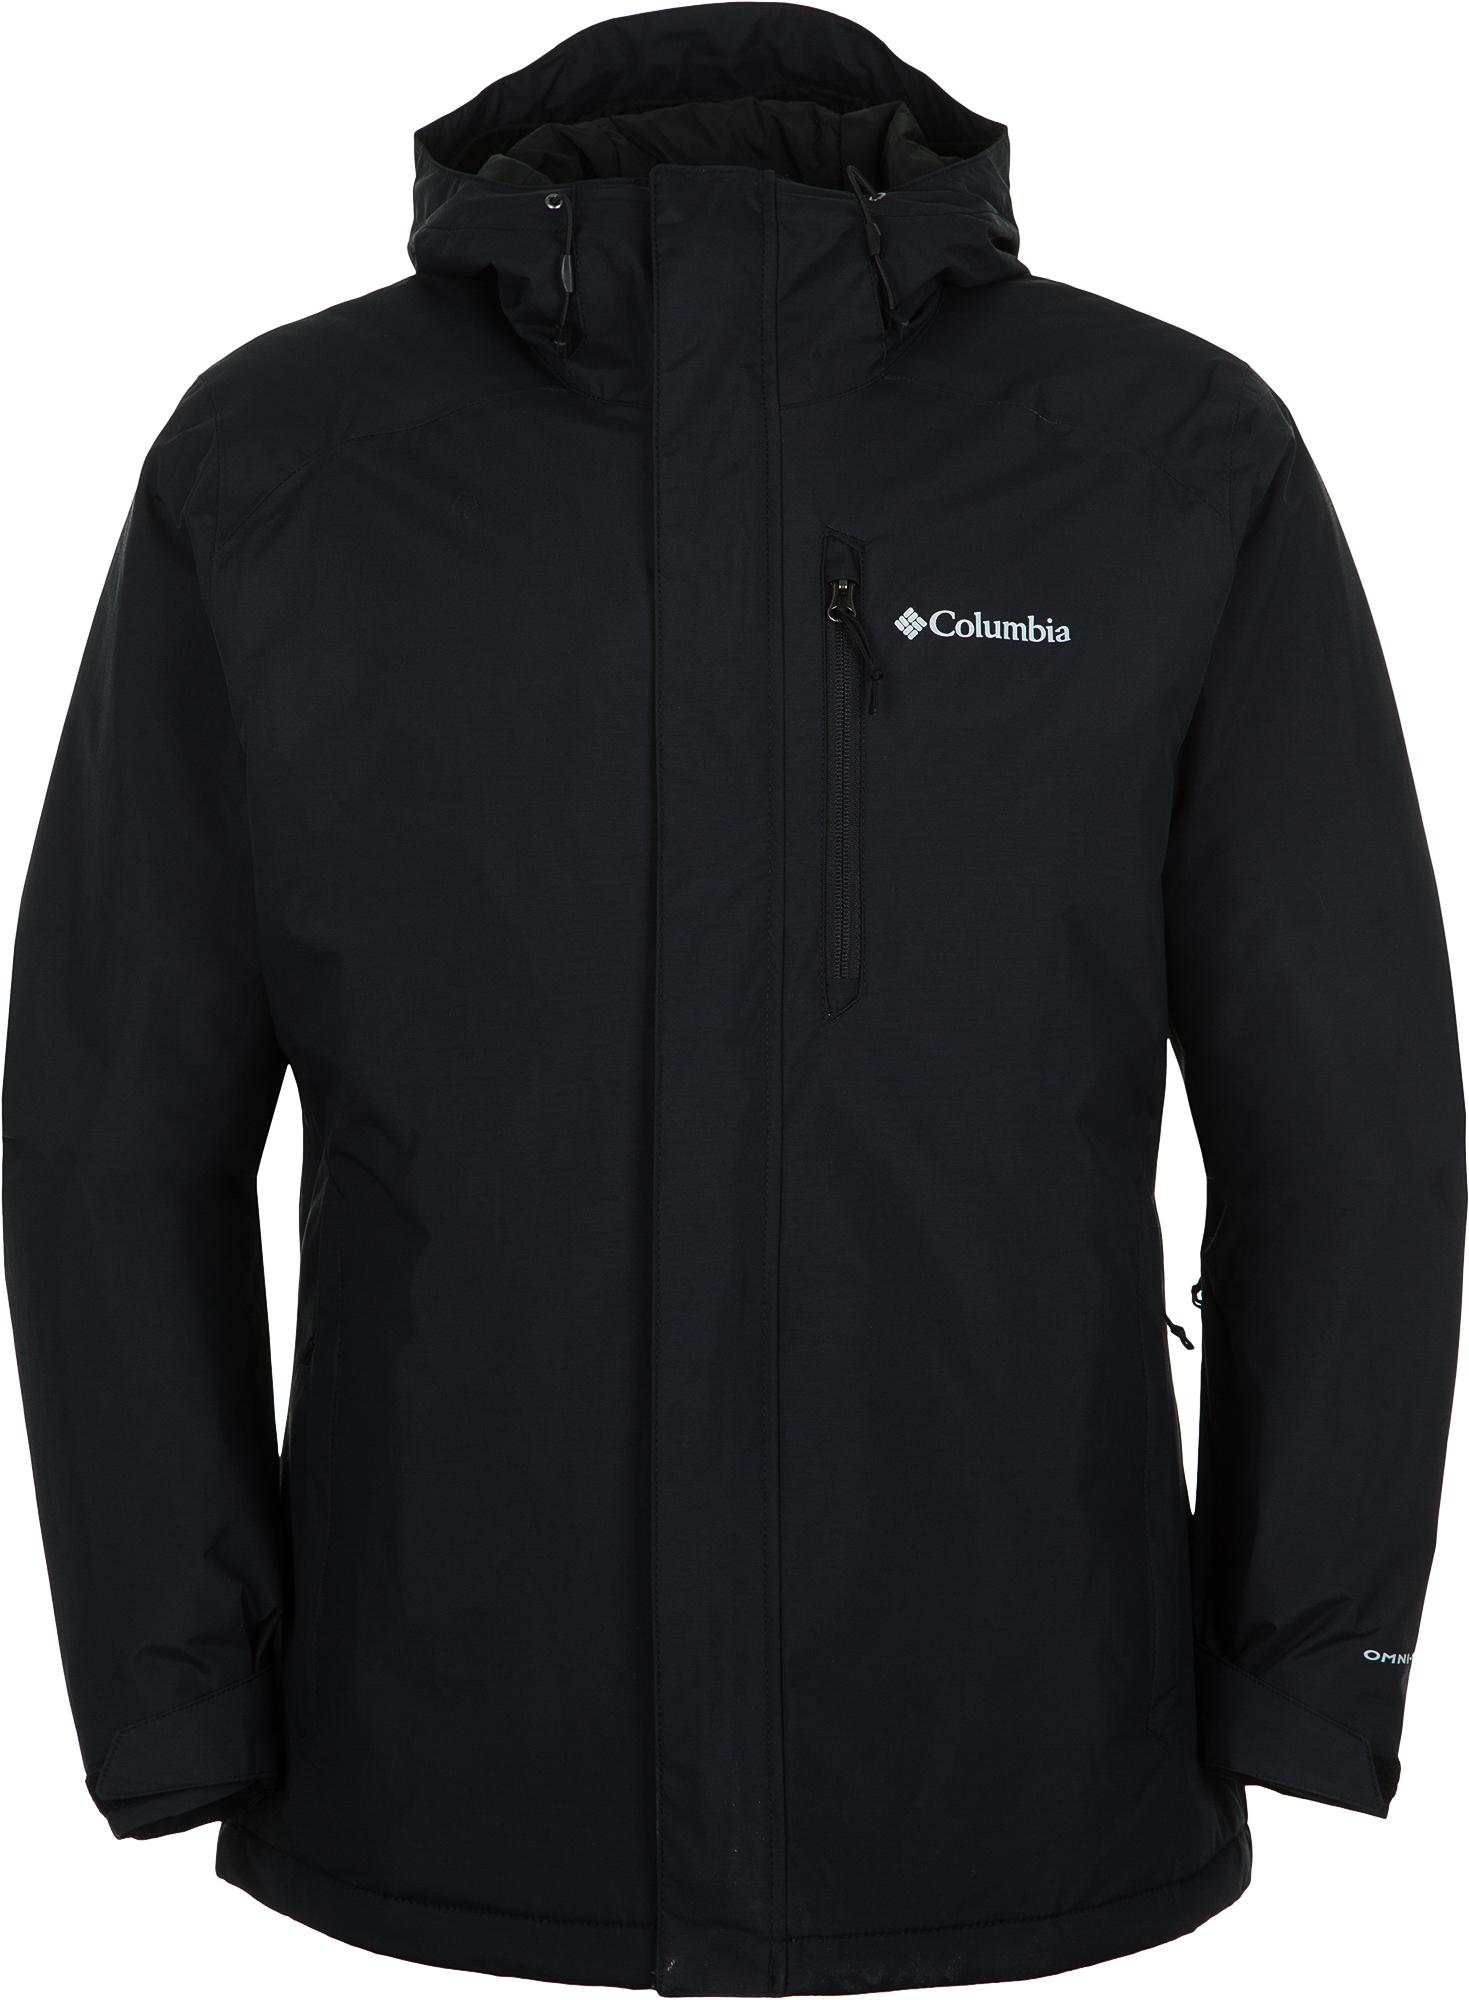 Columbia Куртка утепленная мужская Columbia, размер 46 columbia куртка утепленная мужская columbia eagles call